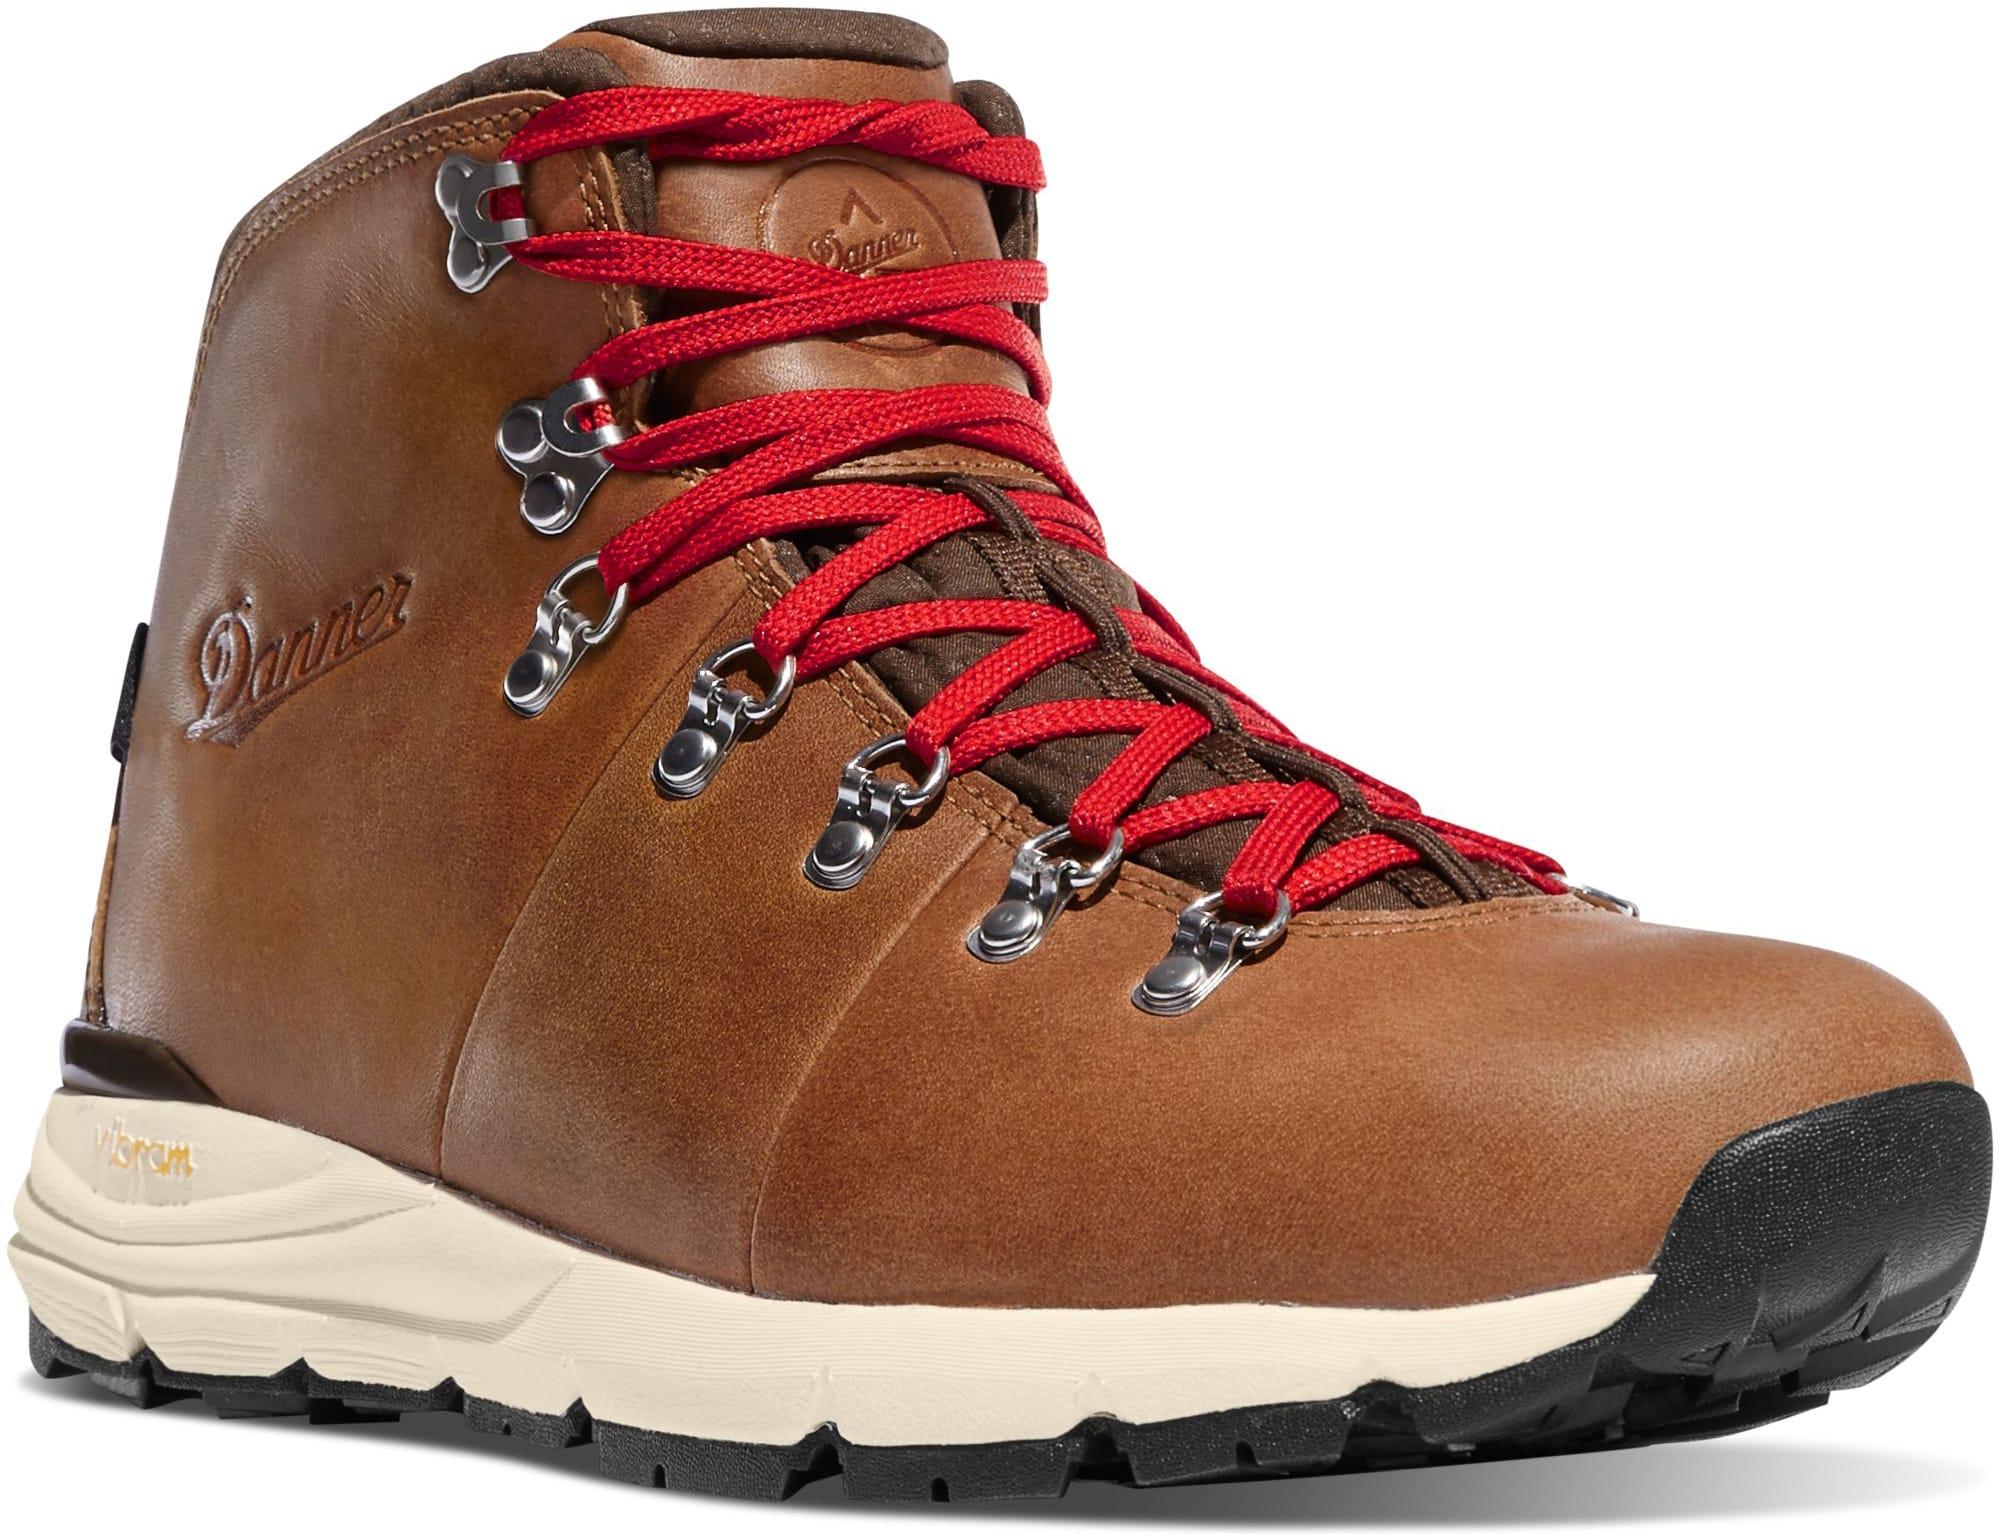 Danner Boots Black Friday